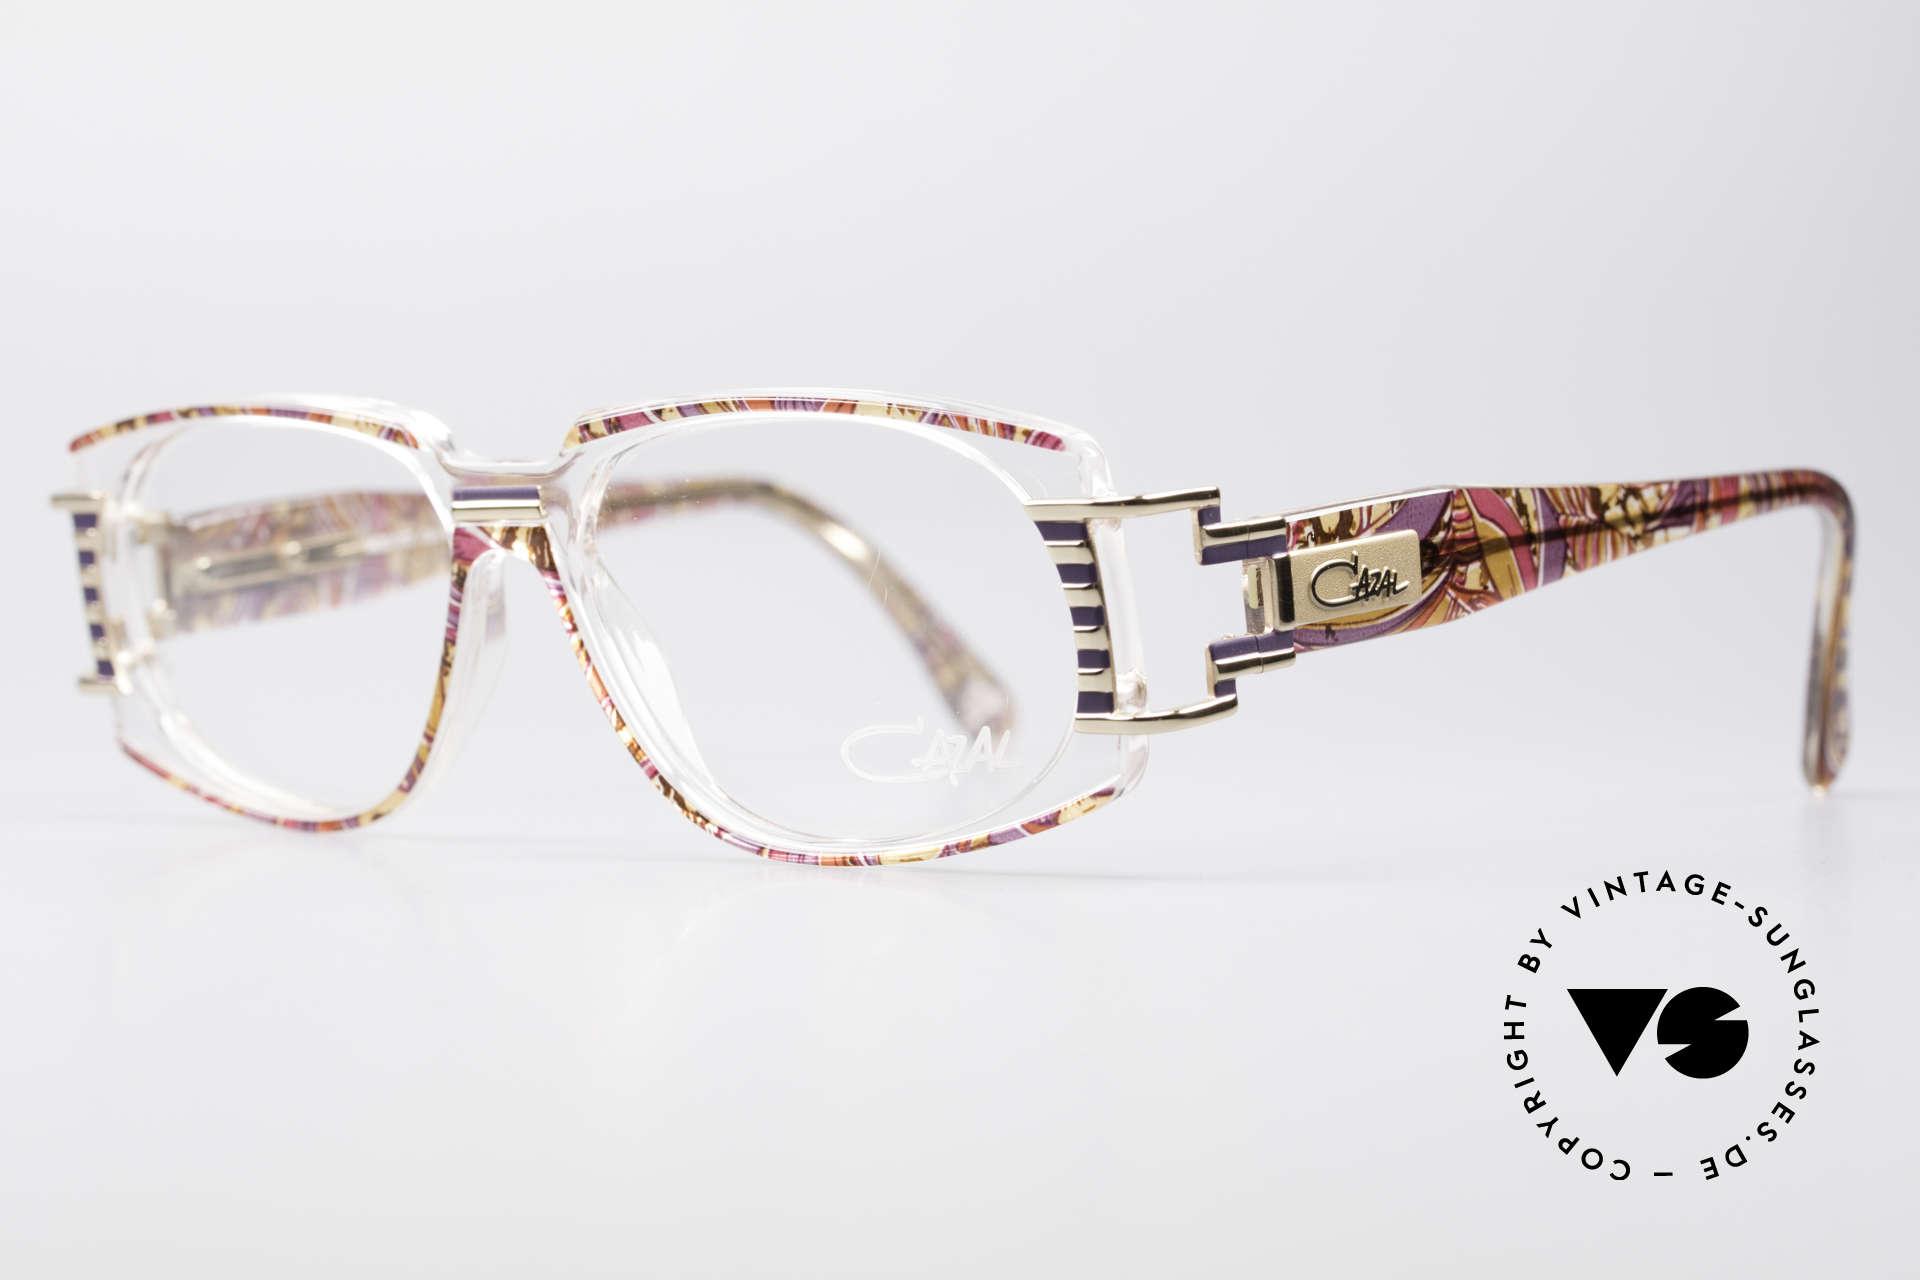 Cazal 372 Rare HipHop Vintage Eyeglasses, interesting & distinctive at the same time; true eye-catcher, Made for Men and Women